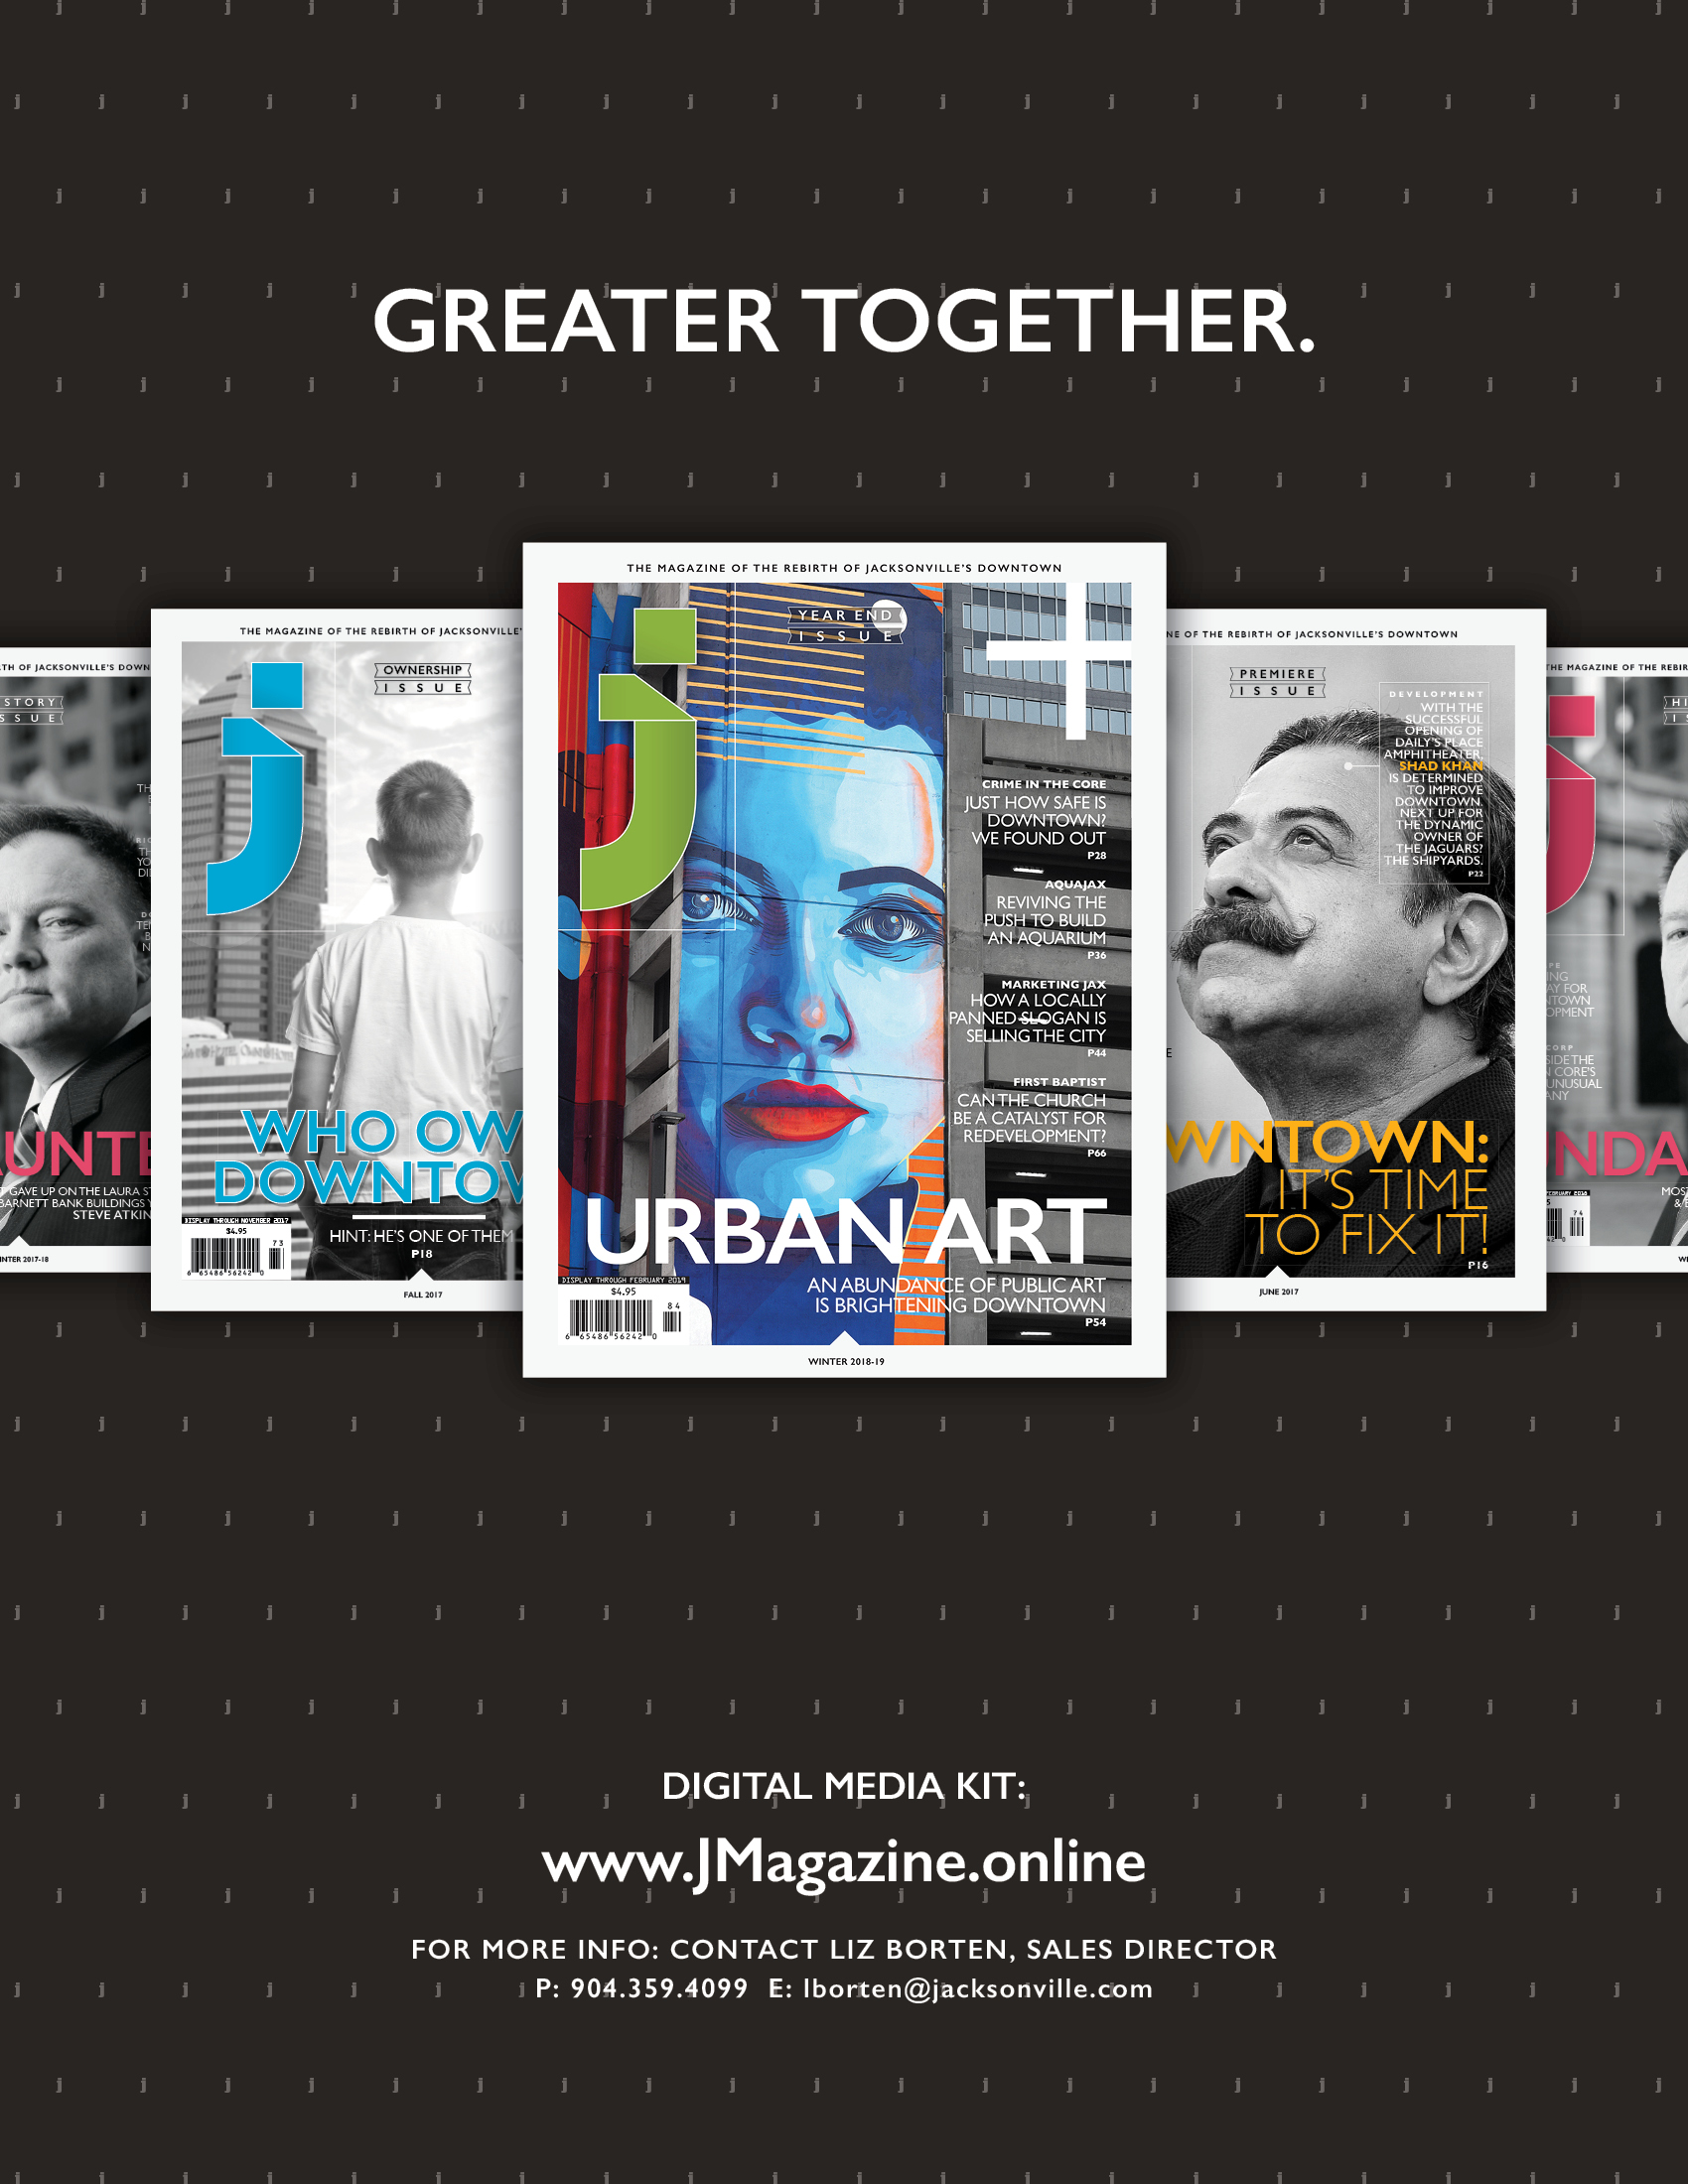 J Mag Media Kit..v2SM12.jpg